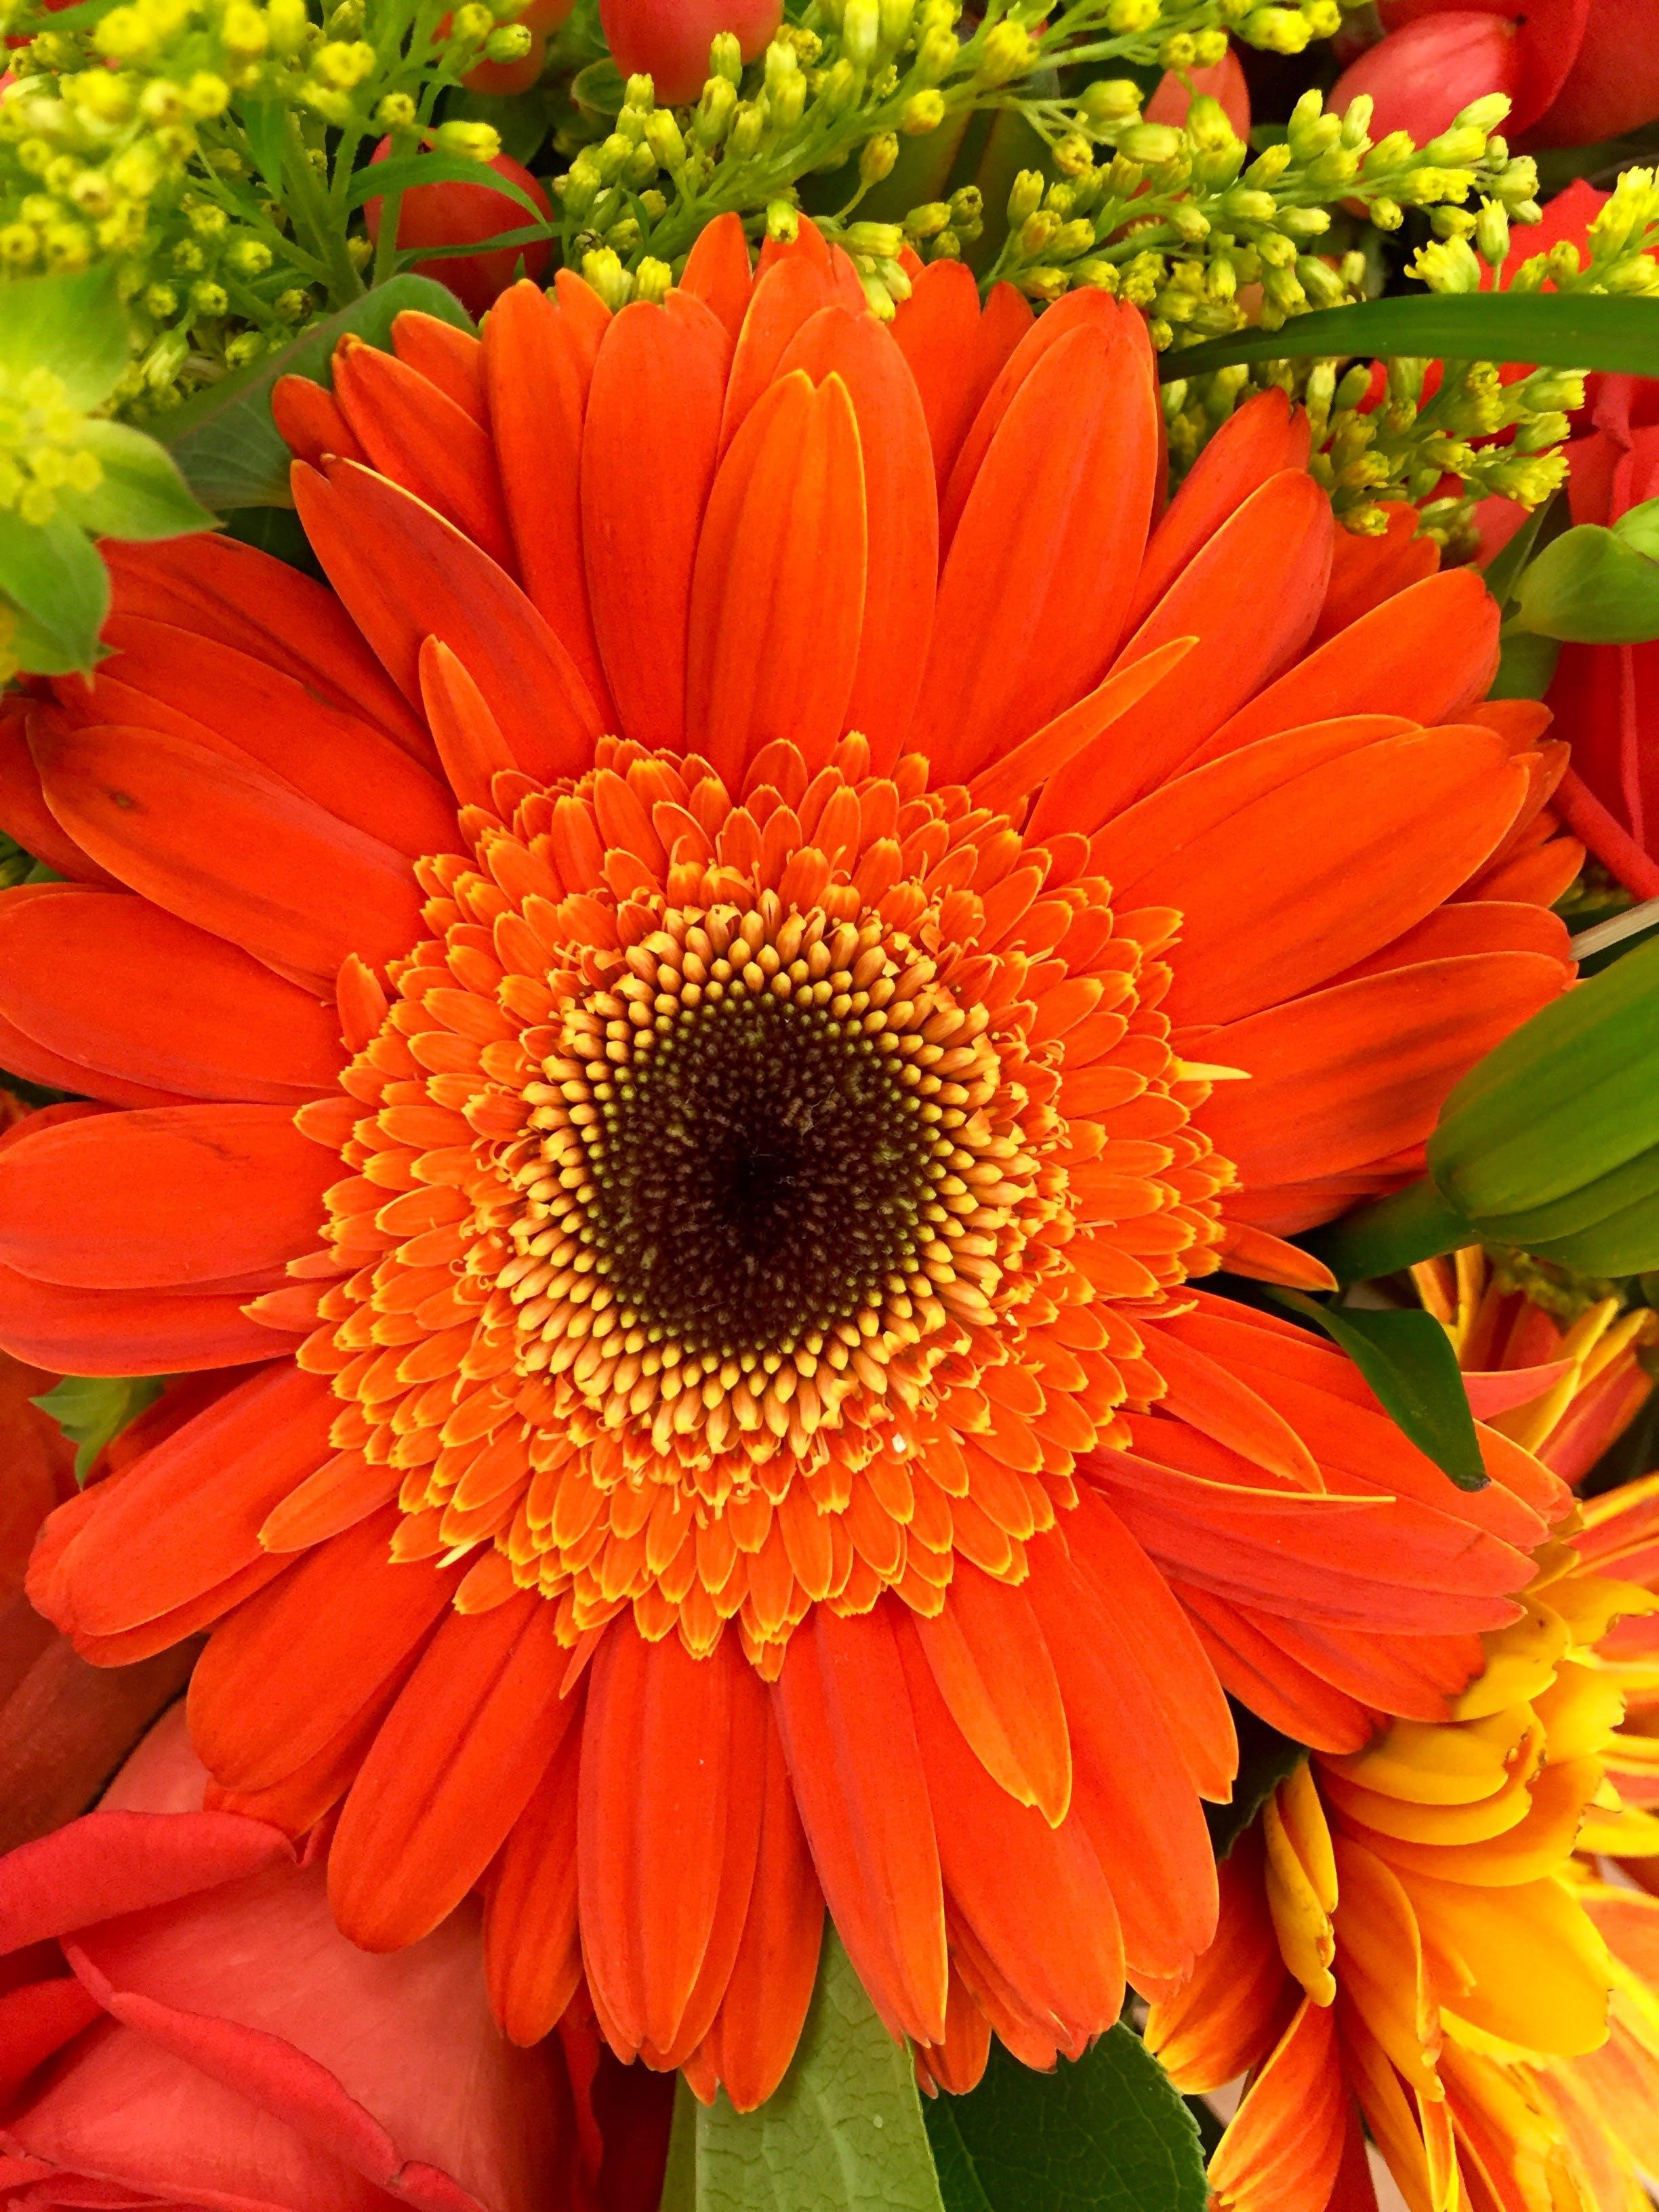 Základová fotografie zdarma na téma flóra, gerbera, kytka, oranžová